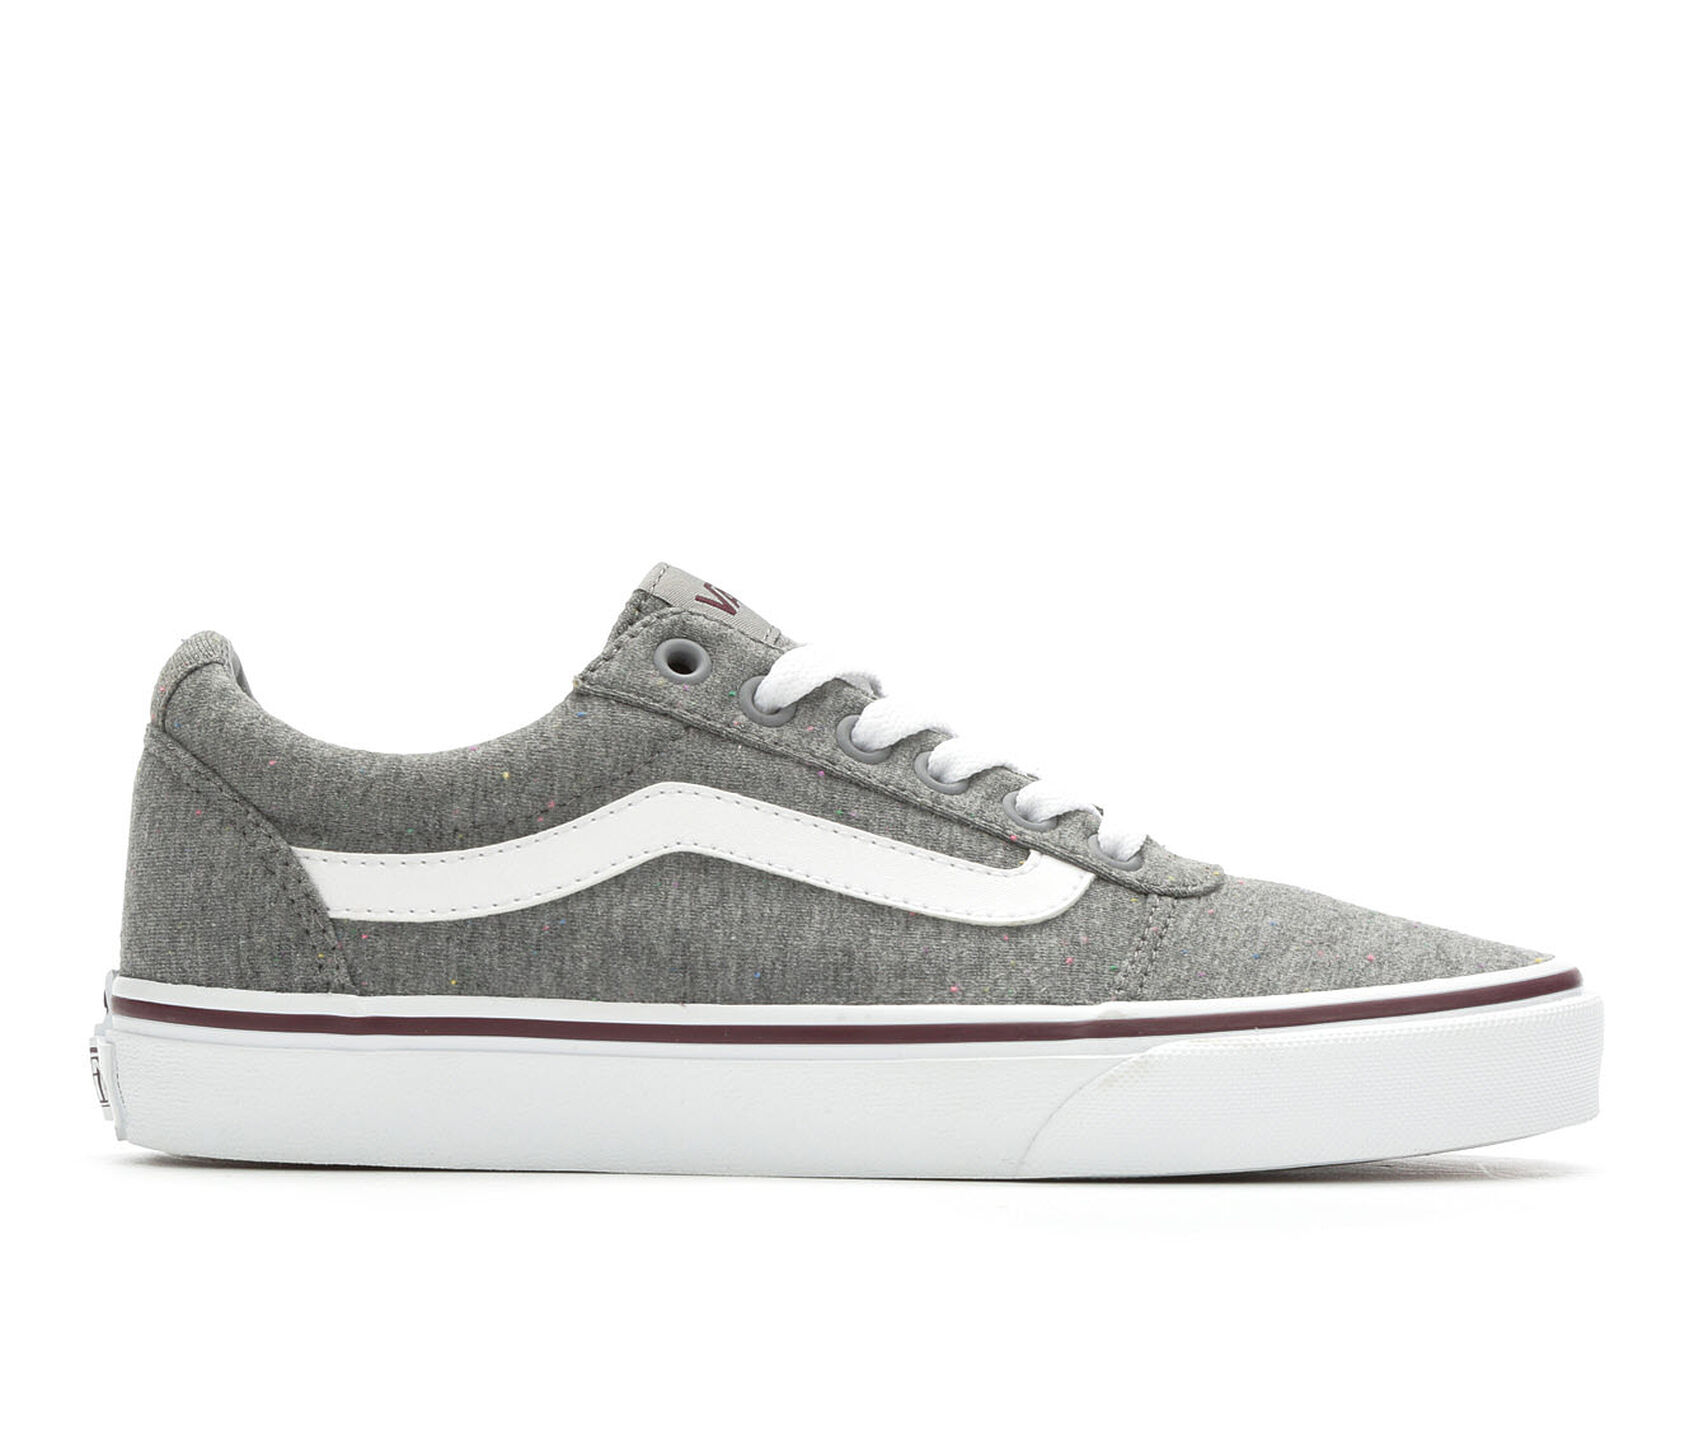 db32131947a ... Vans Ward Suiting Skate Sneakers. Previous